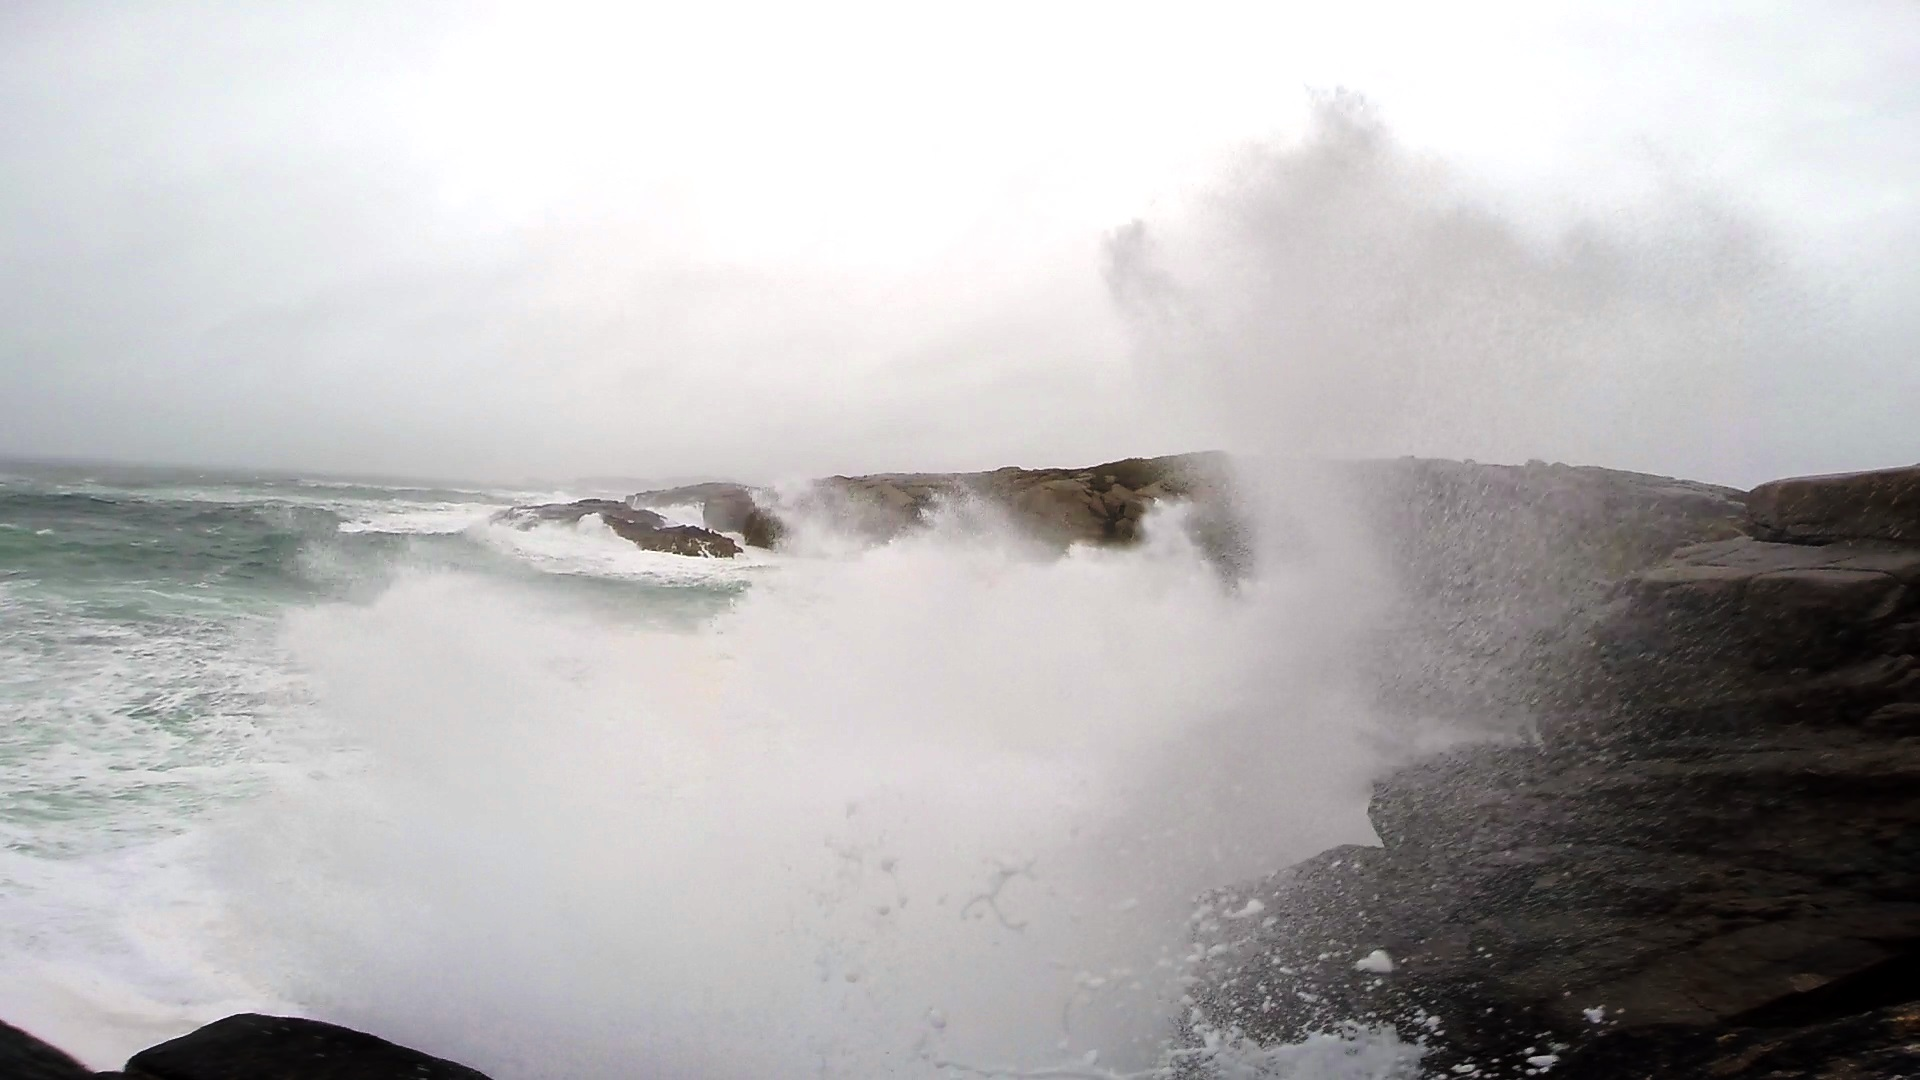 storm Desmond Ireland Donegal